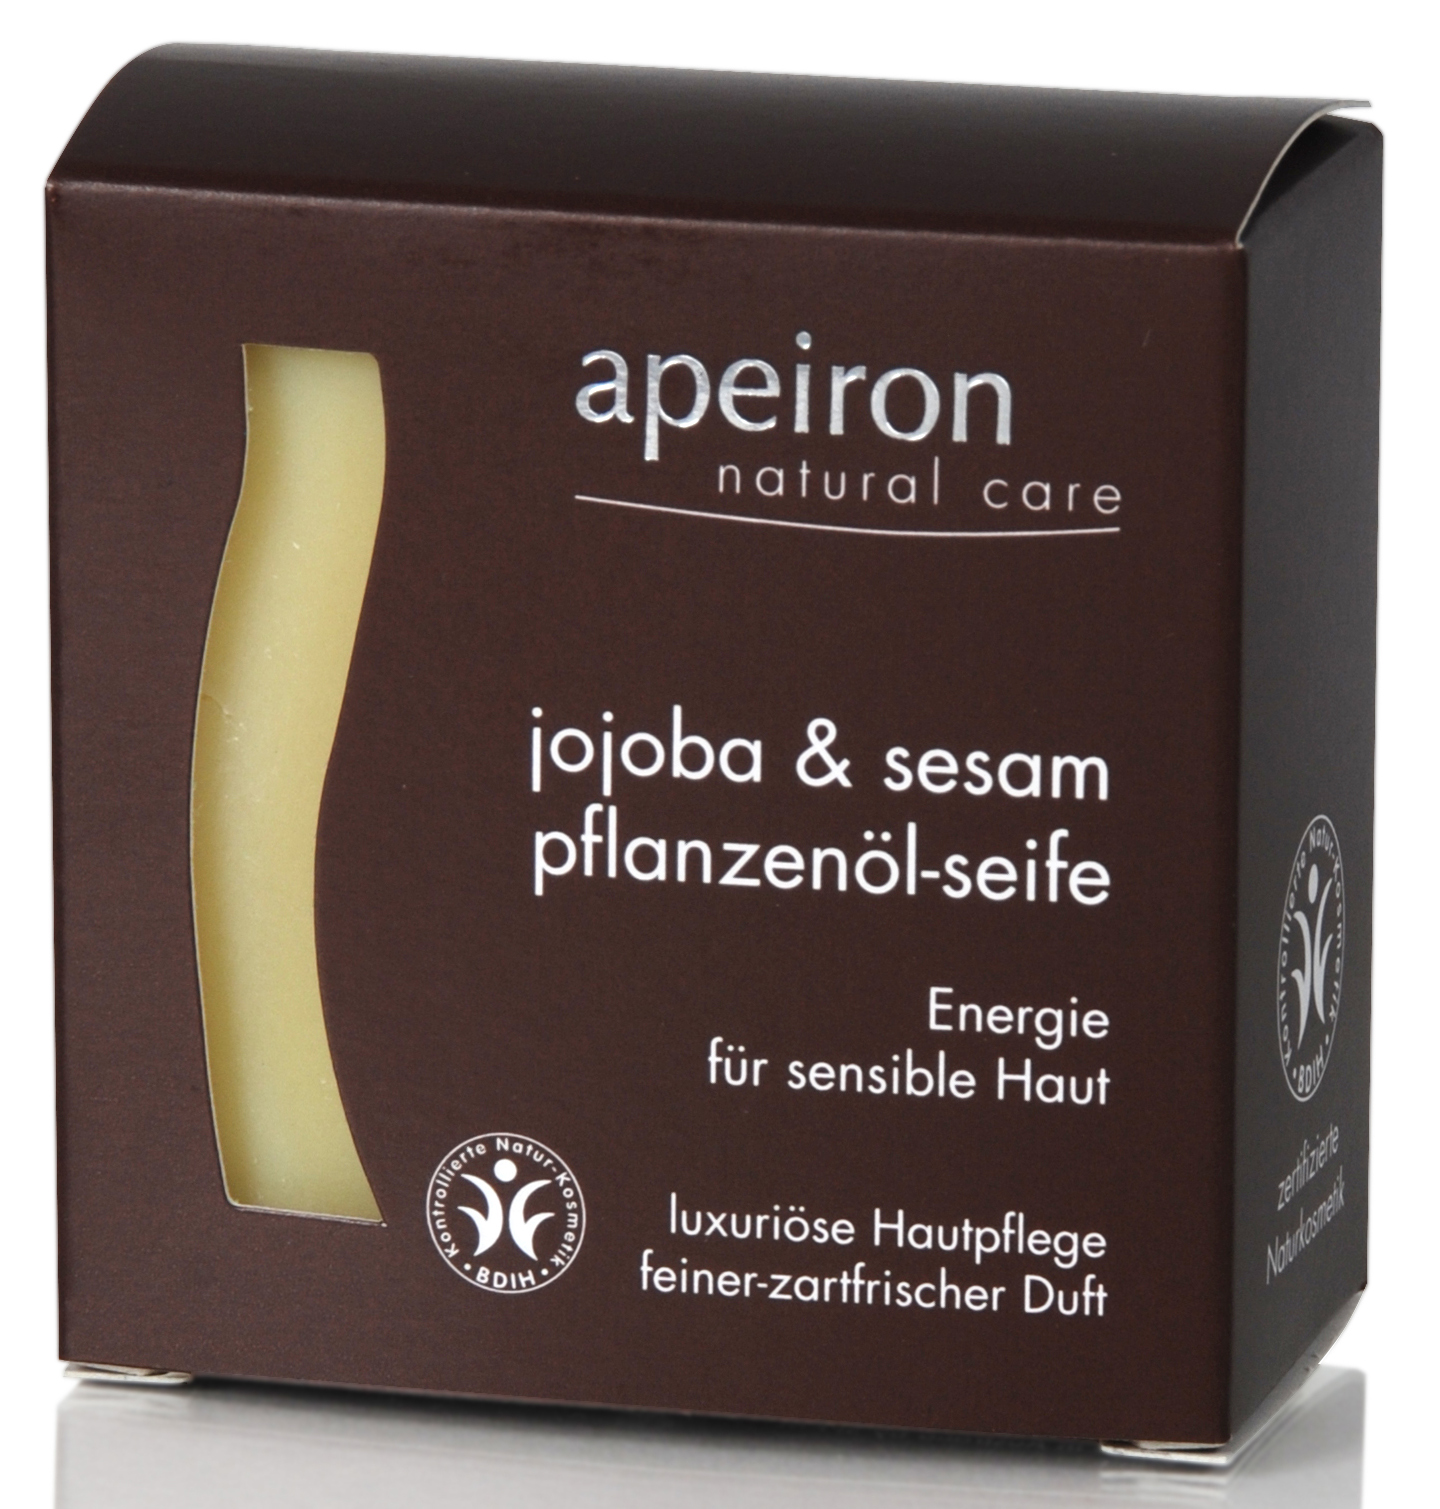 Jojoba & Sesam - Energie für sensible Haut